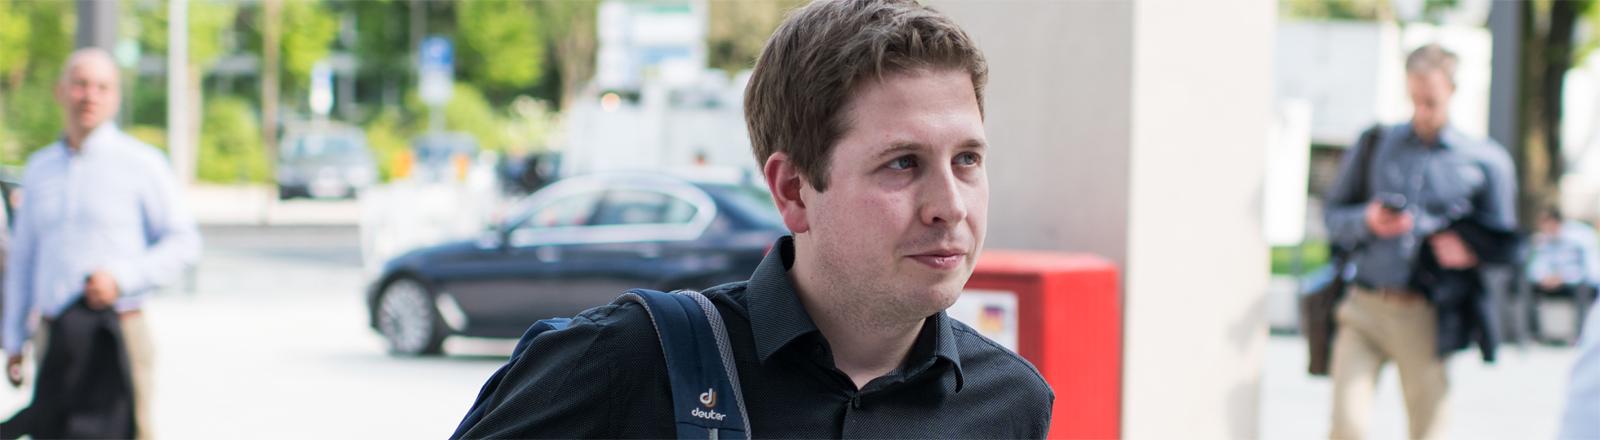 Kevin Kühnert im April 2018 in Wiesbaden